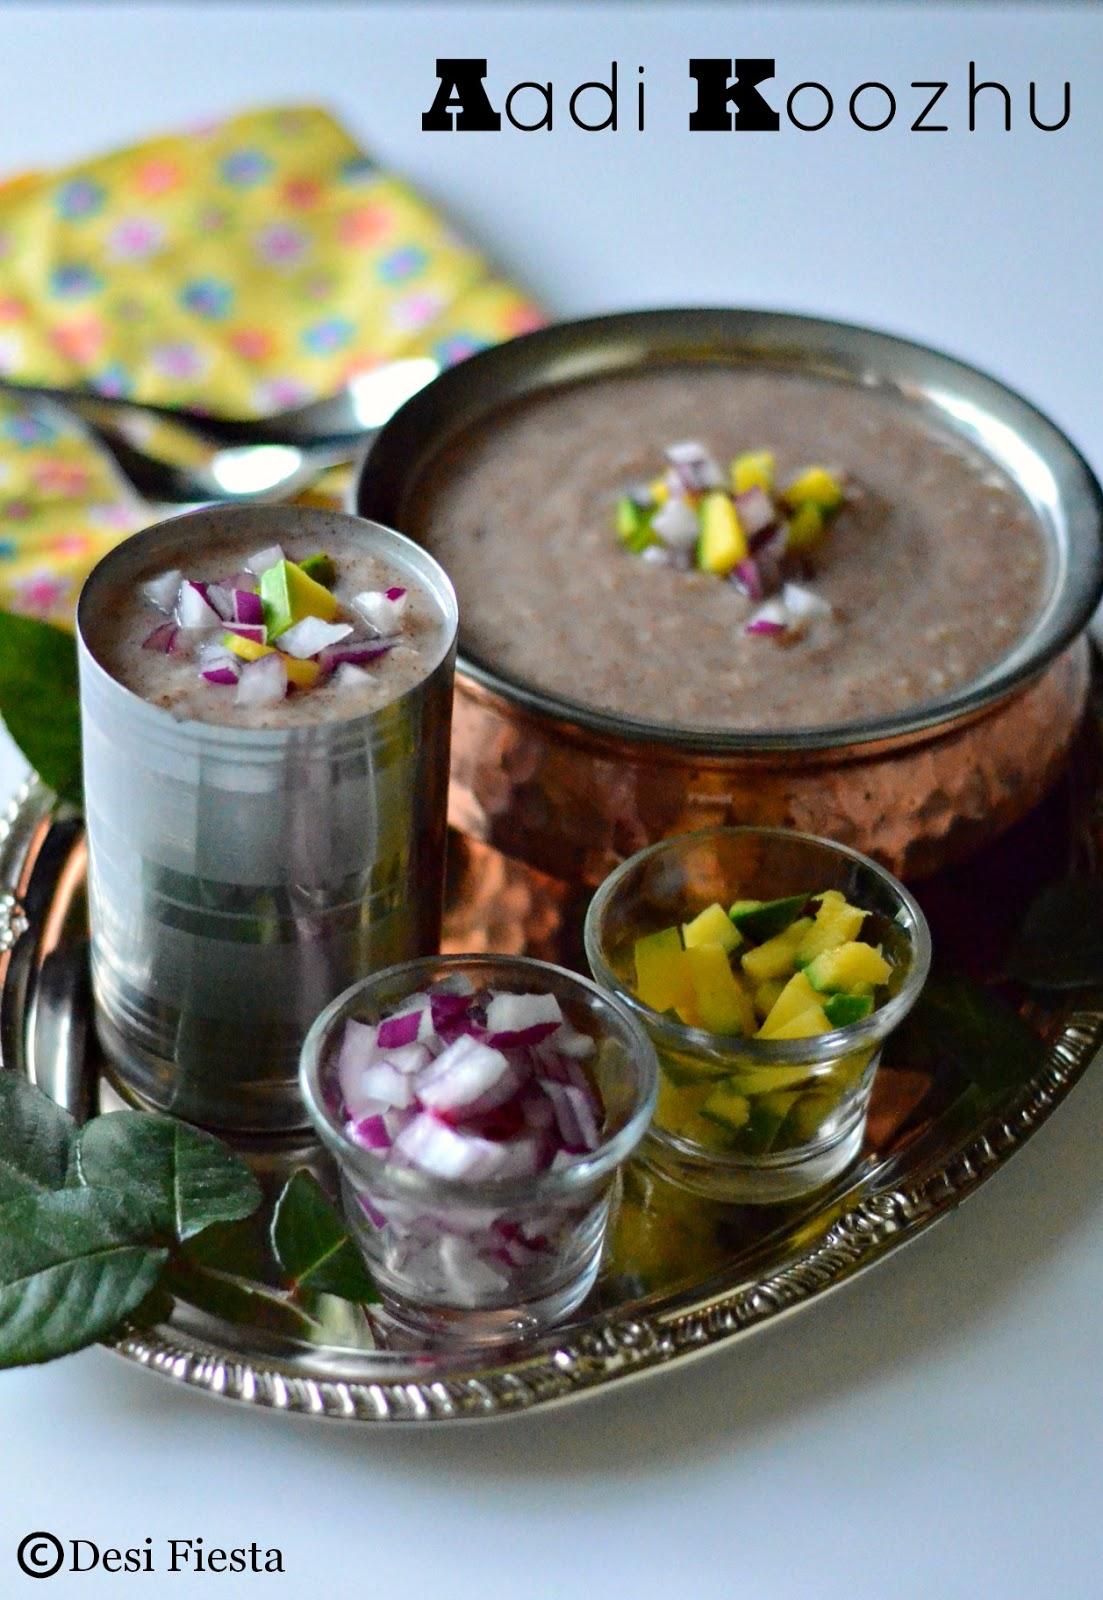 Aadi pandigai or aadi perukku recipes